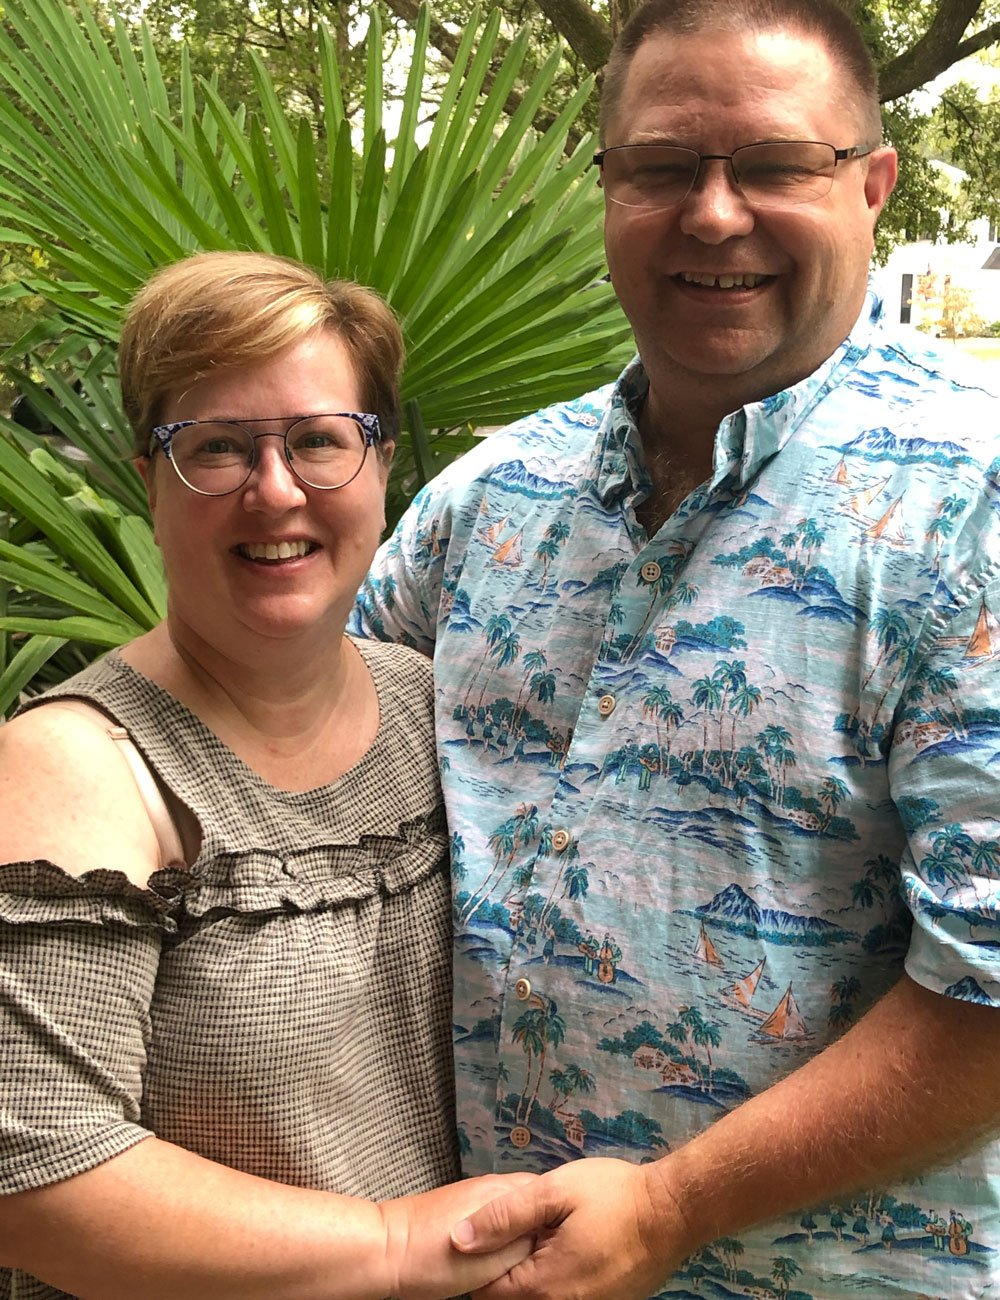 Jeff & Krista